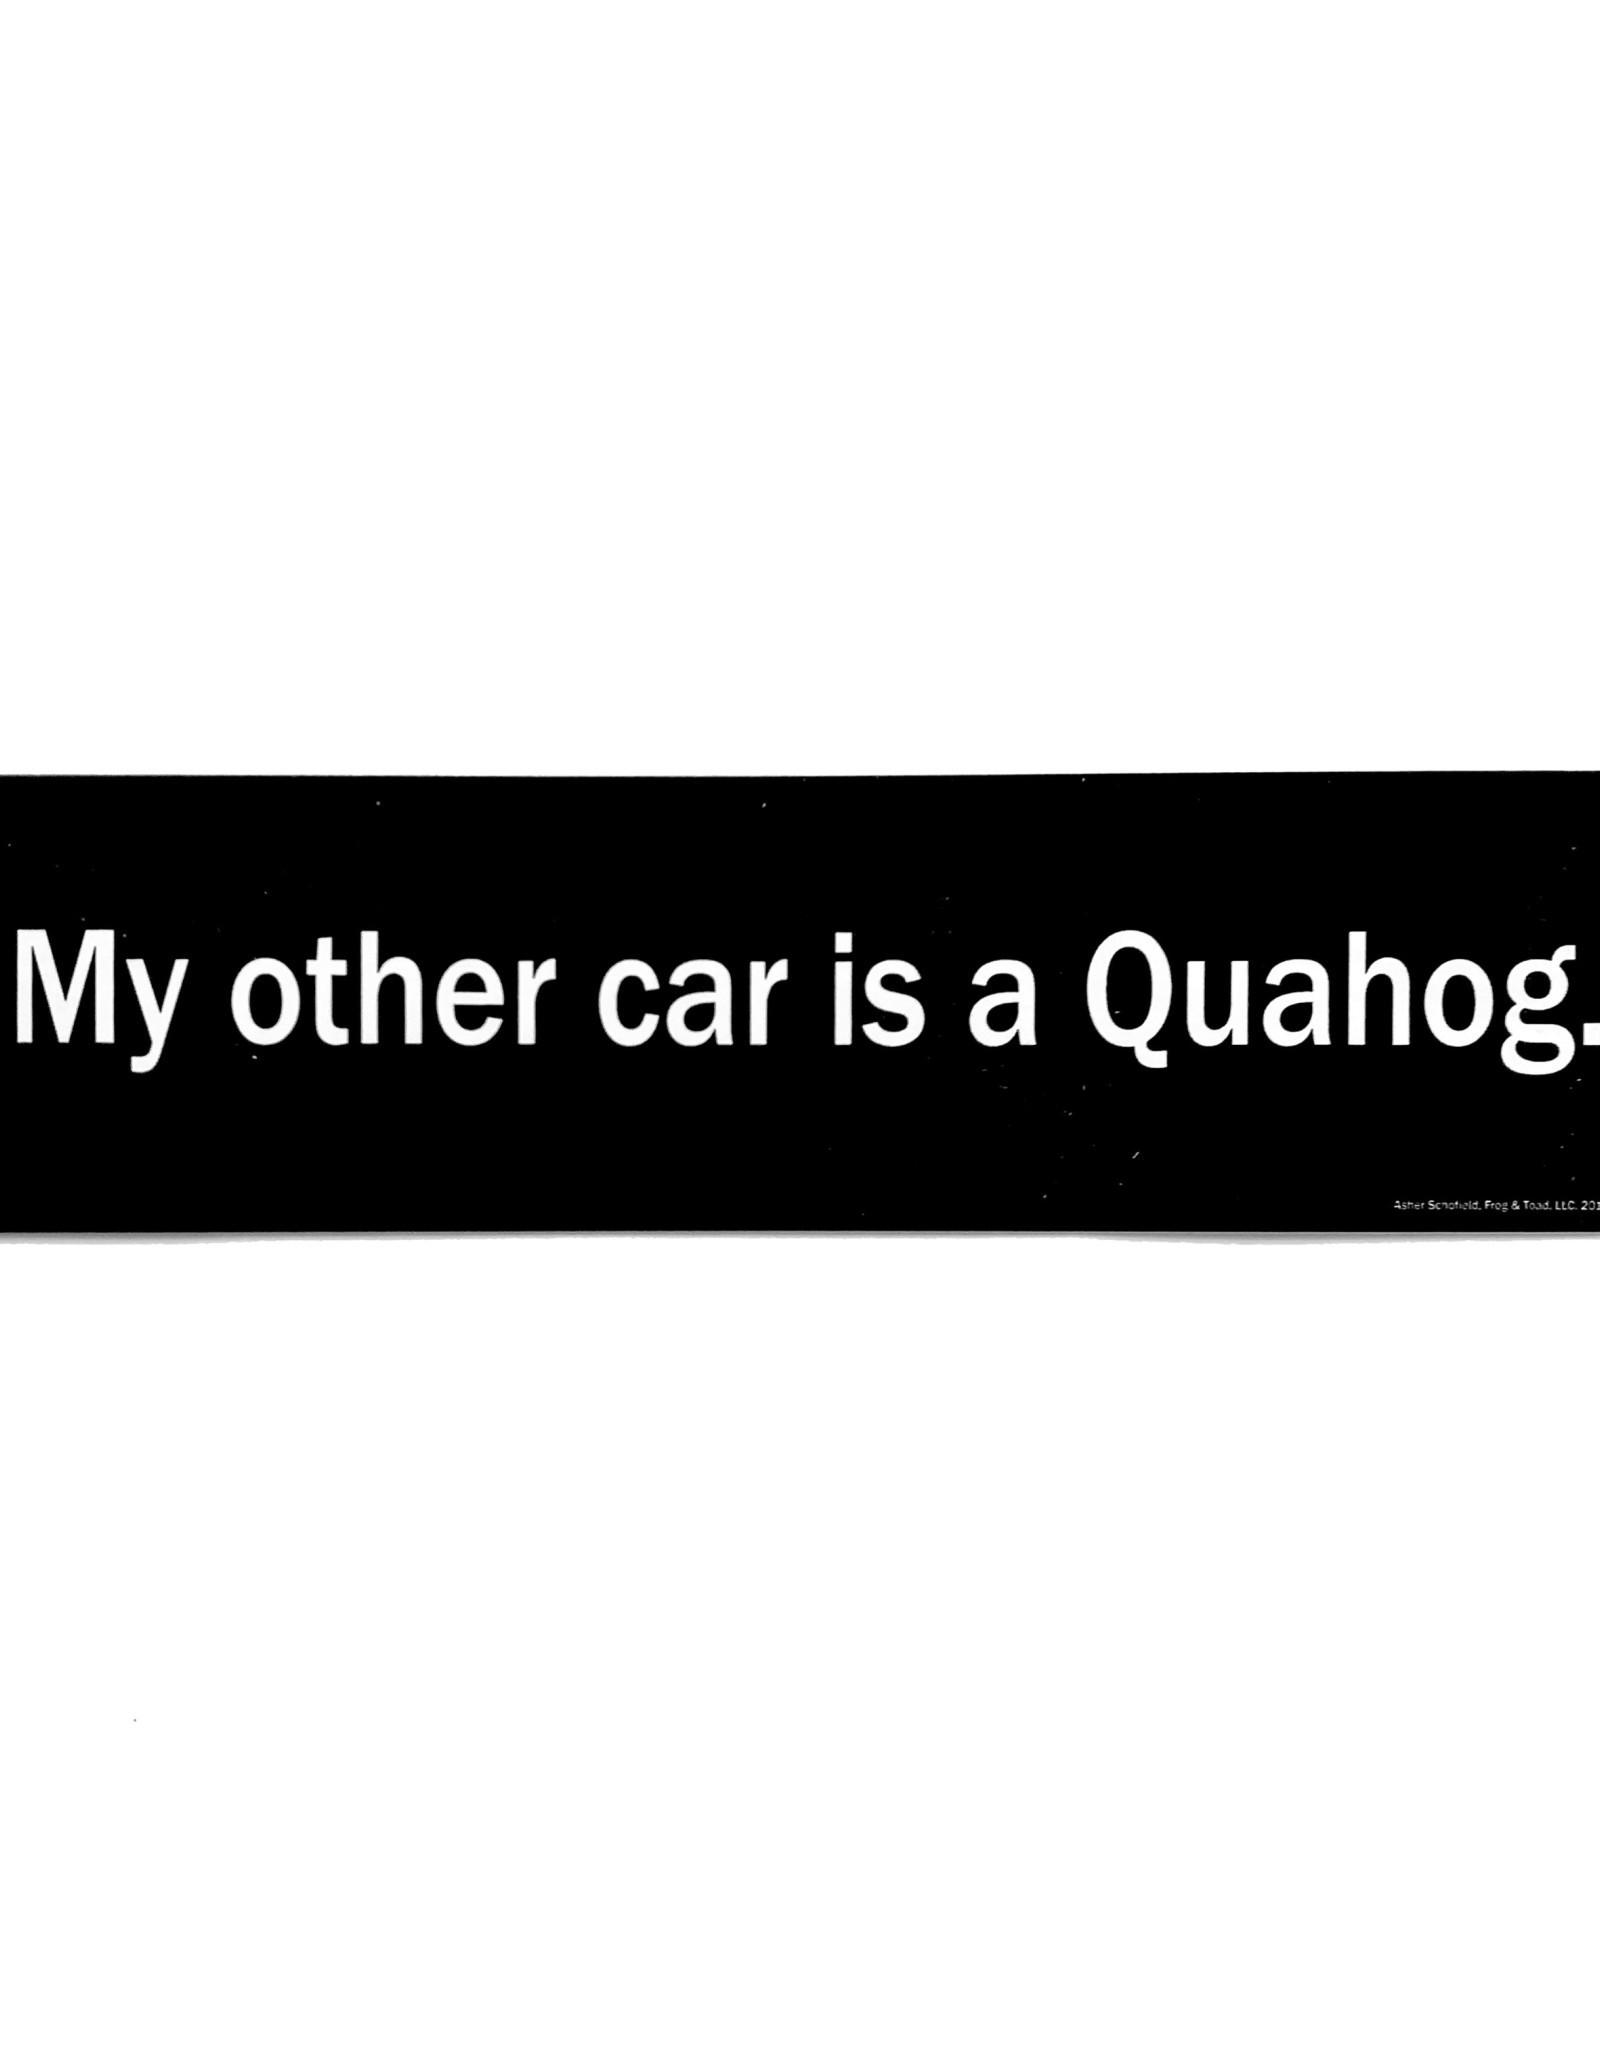 My Other Car Is A Quahog Bumper Sticker